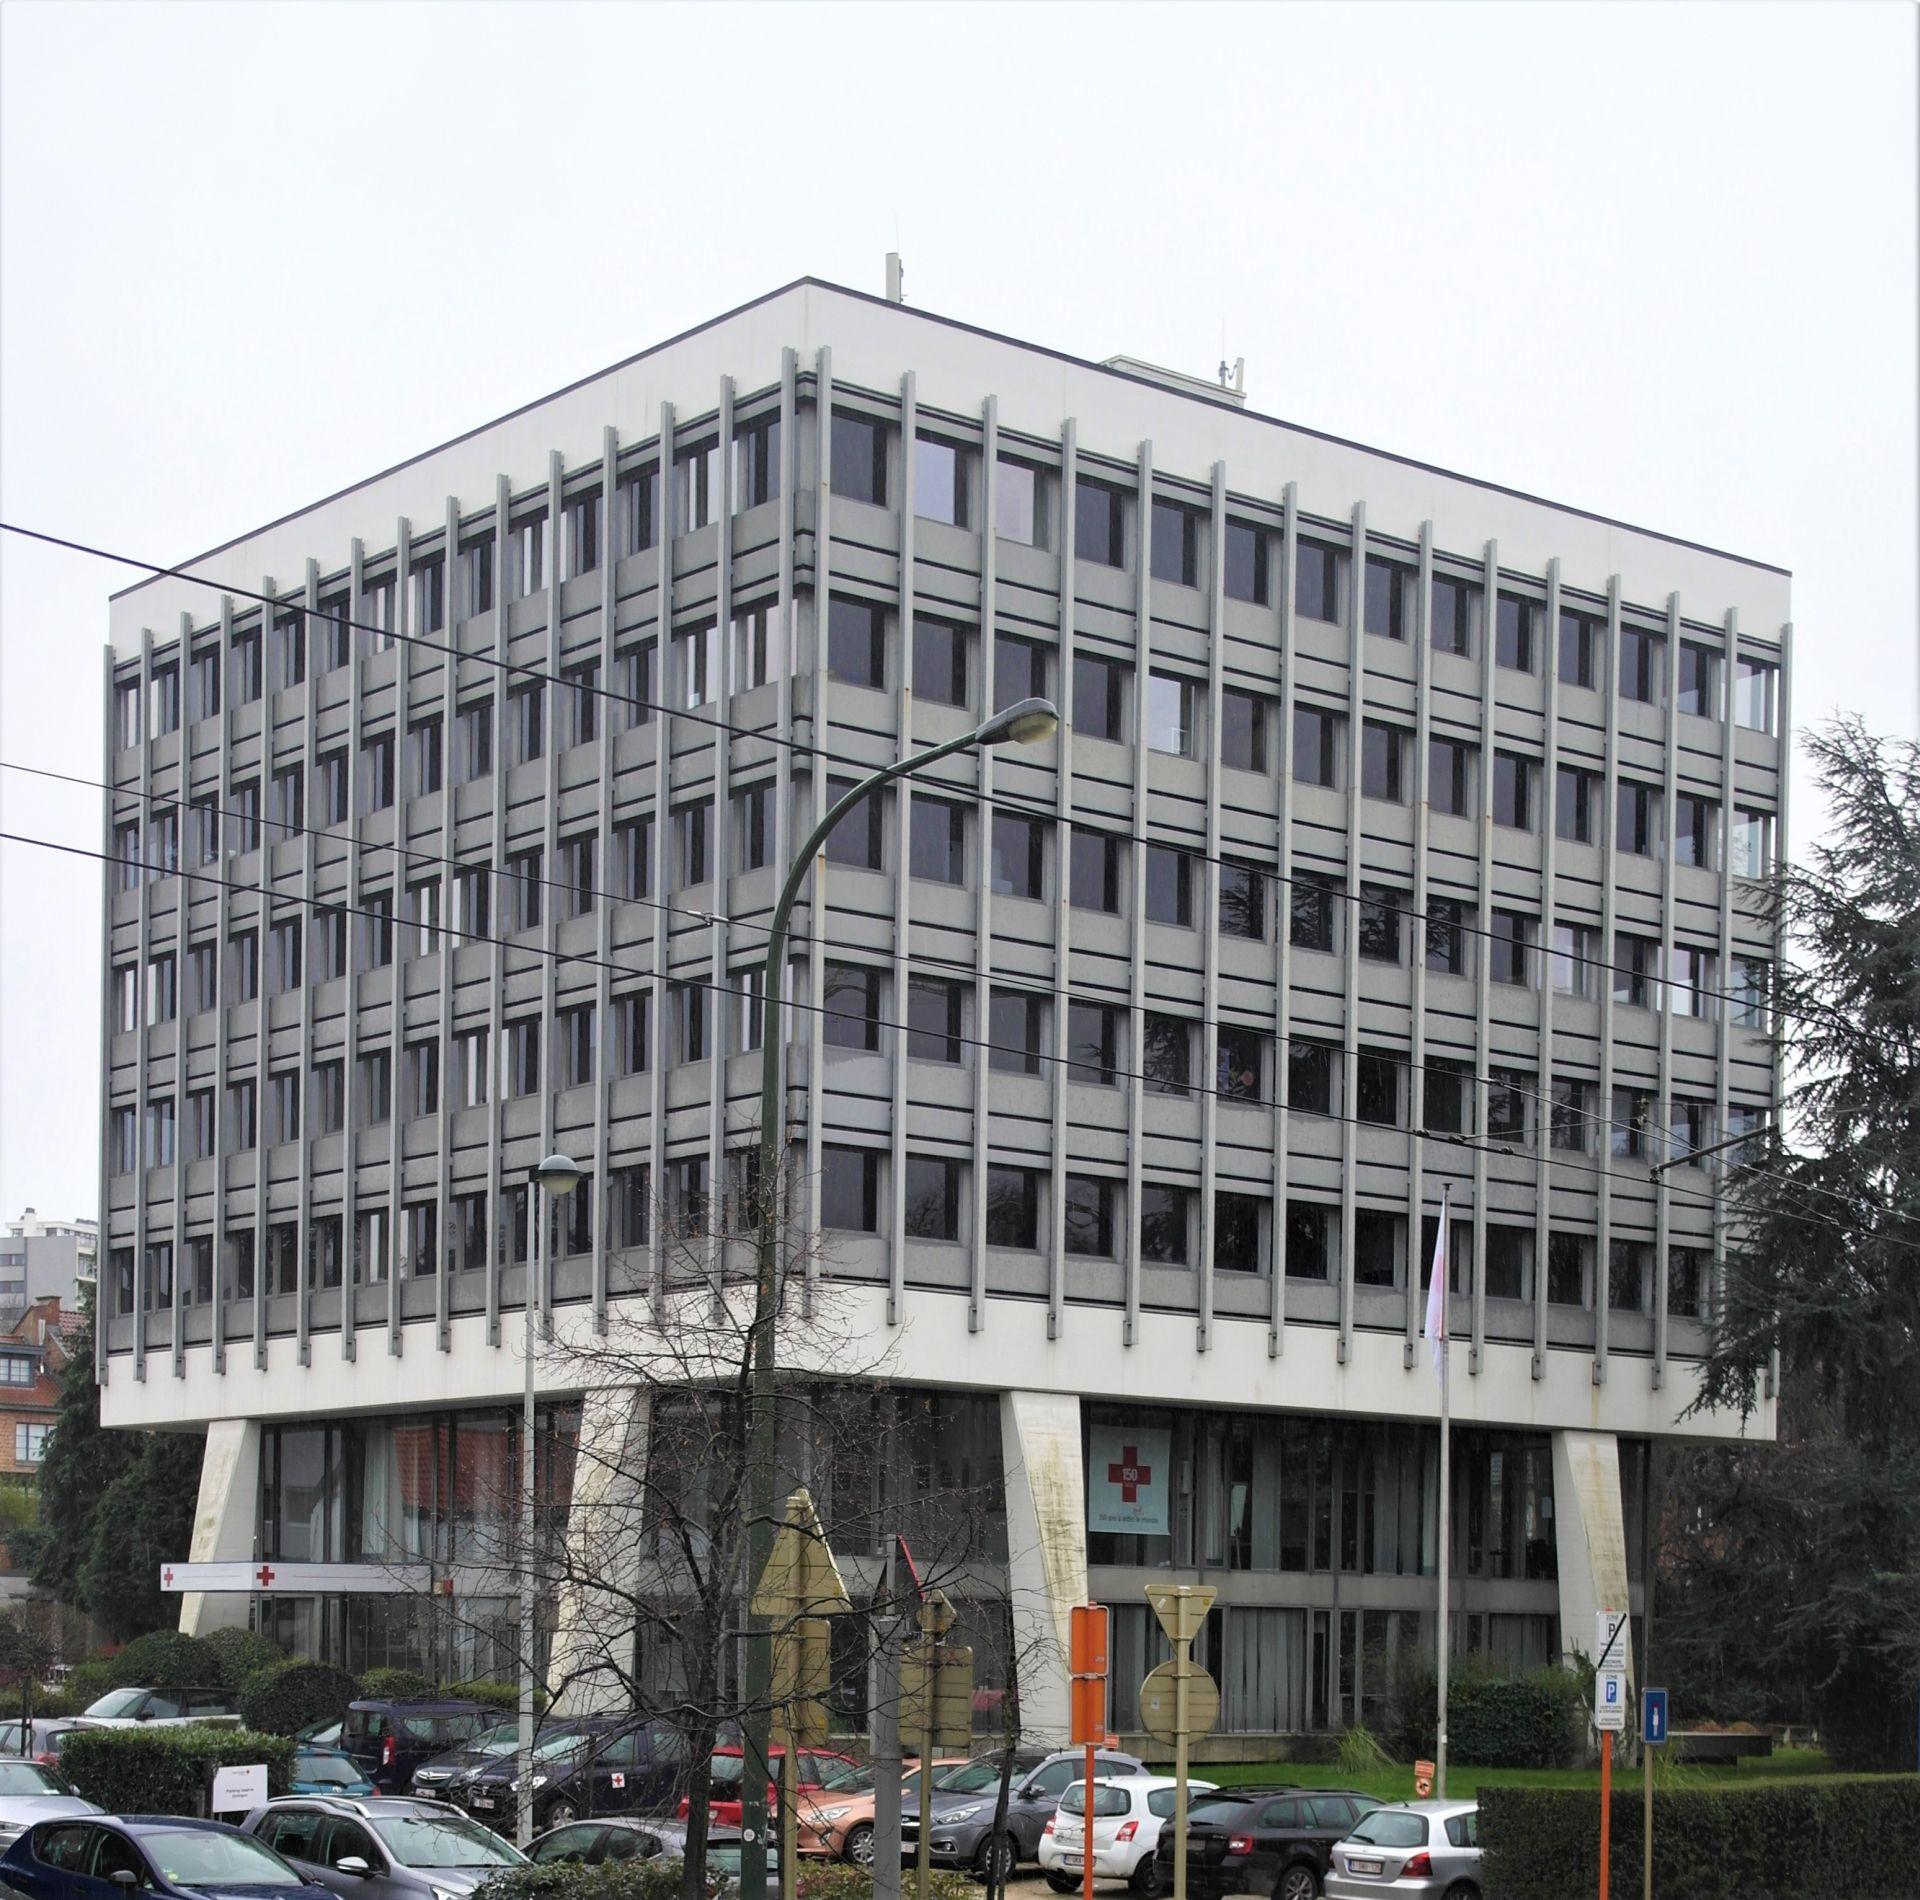 Rue de Stalle 96. Ancien siège Brown, Boveri & Cie, 2020